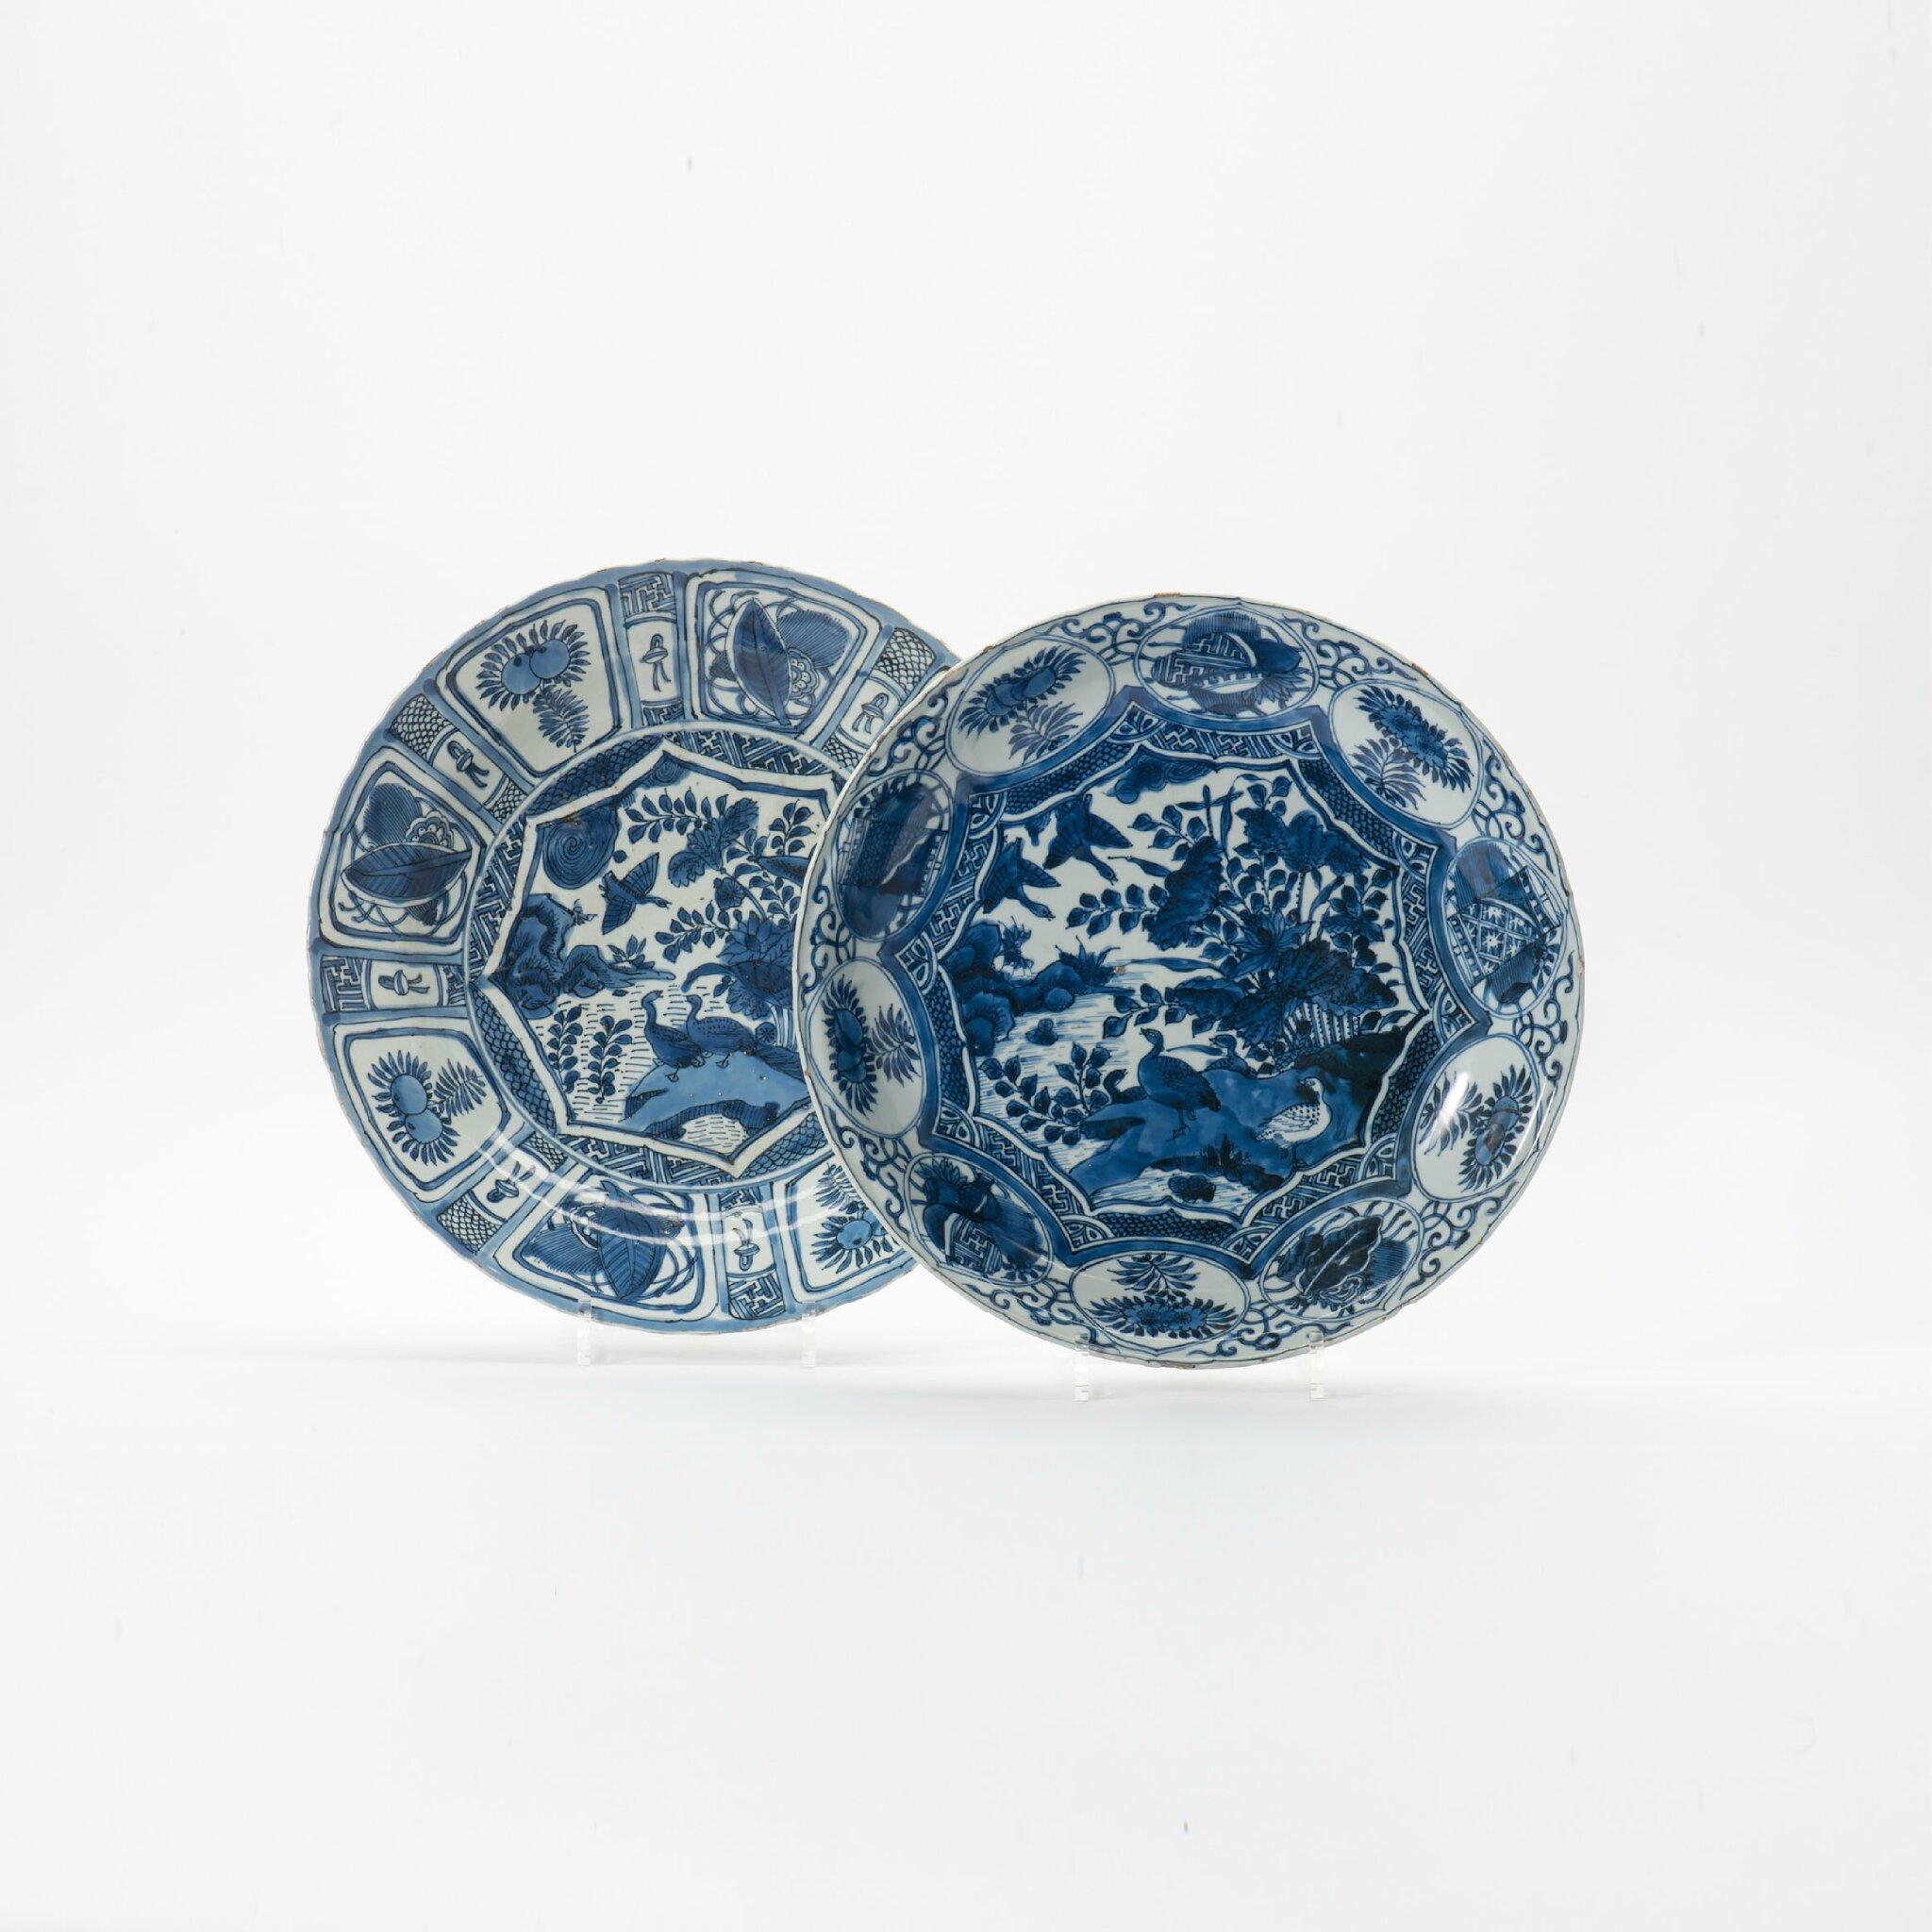 A Kraak porcelain dish and a dish, Wanli period (1573-1619)